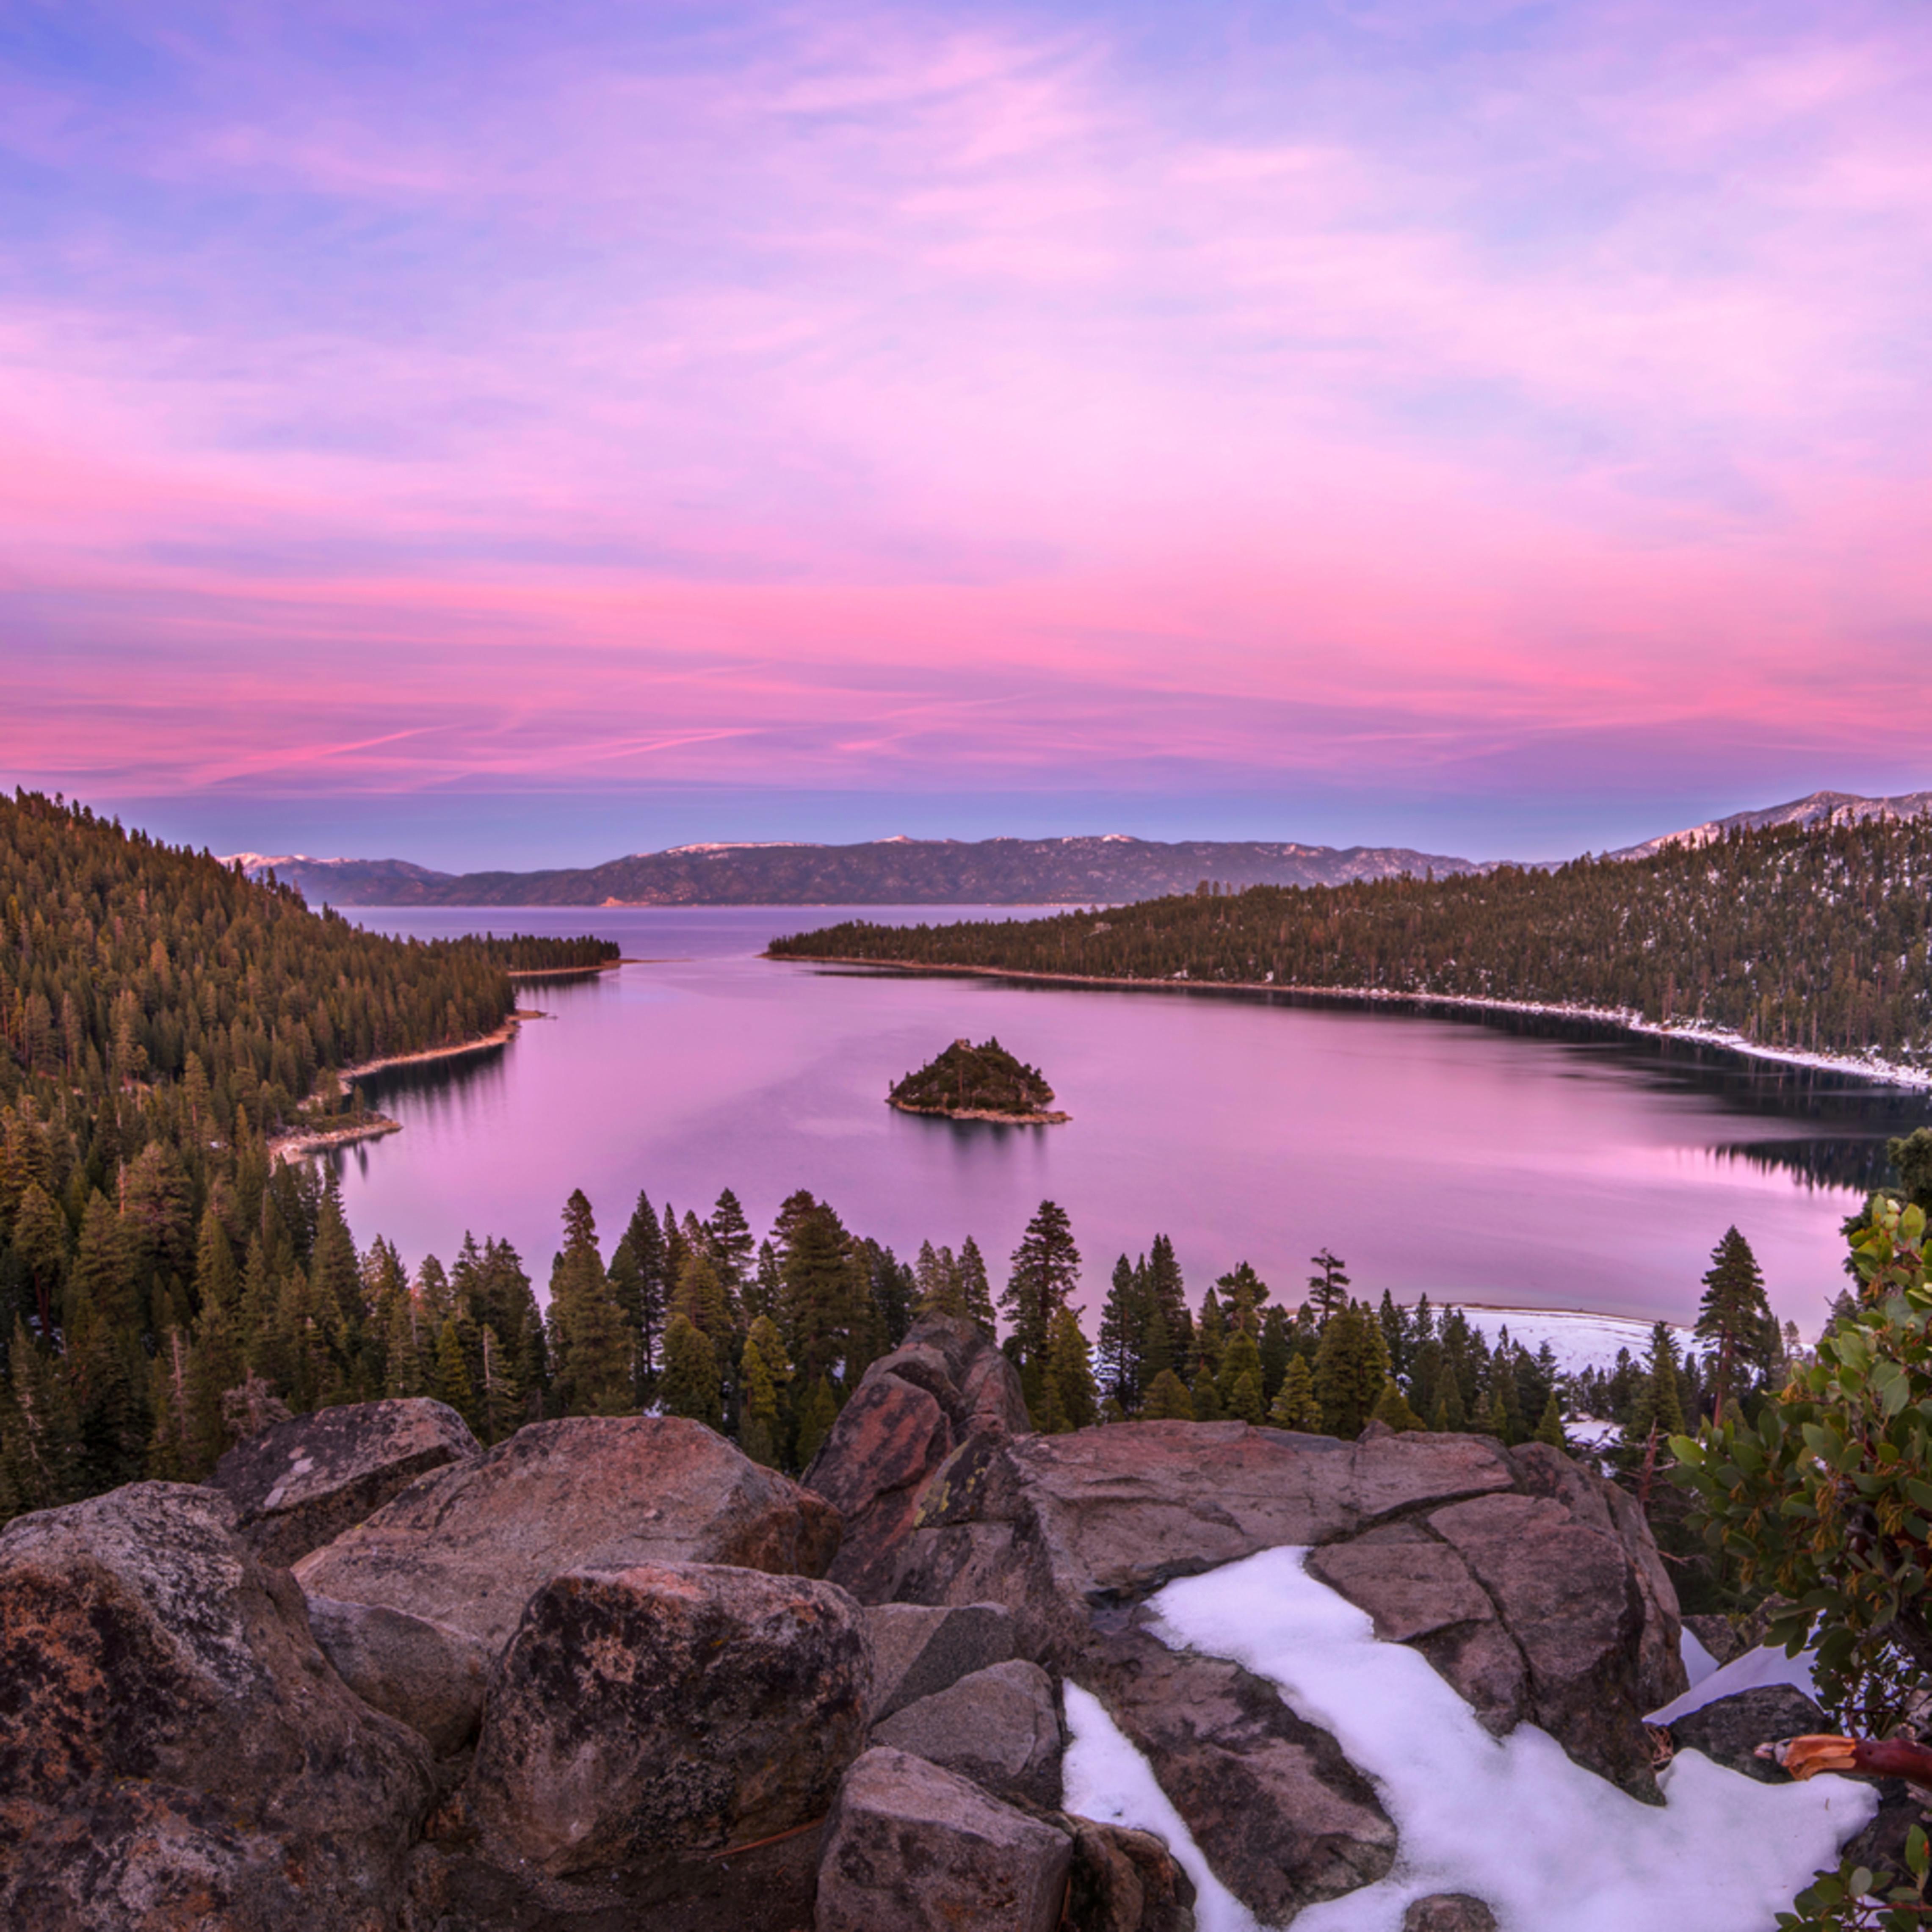 Emerald bay sunset 11 18 lvukqb